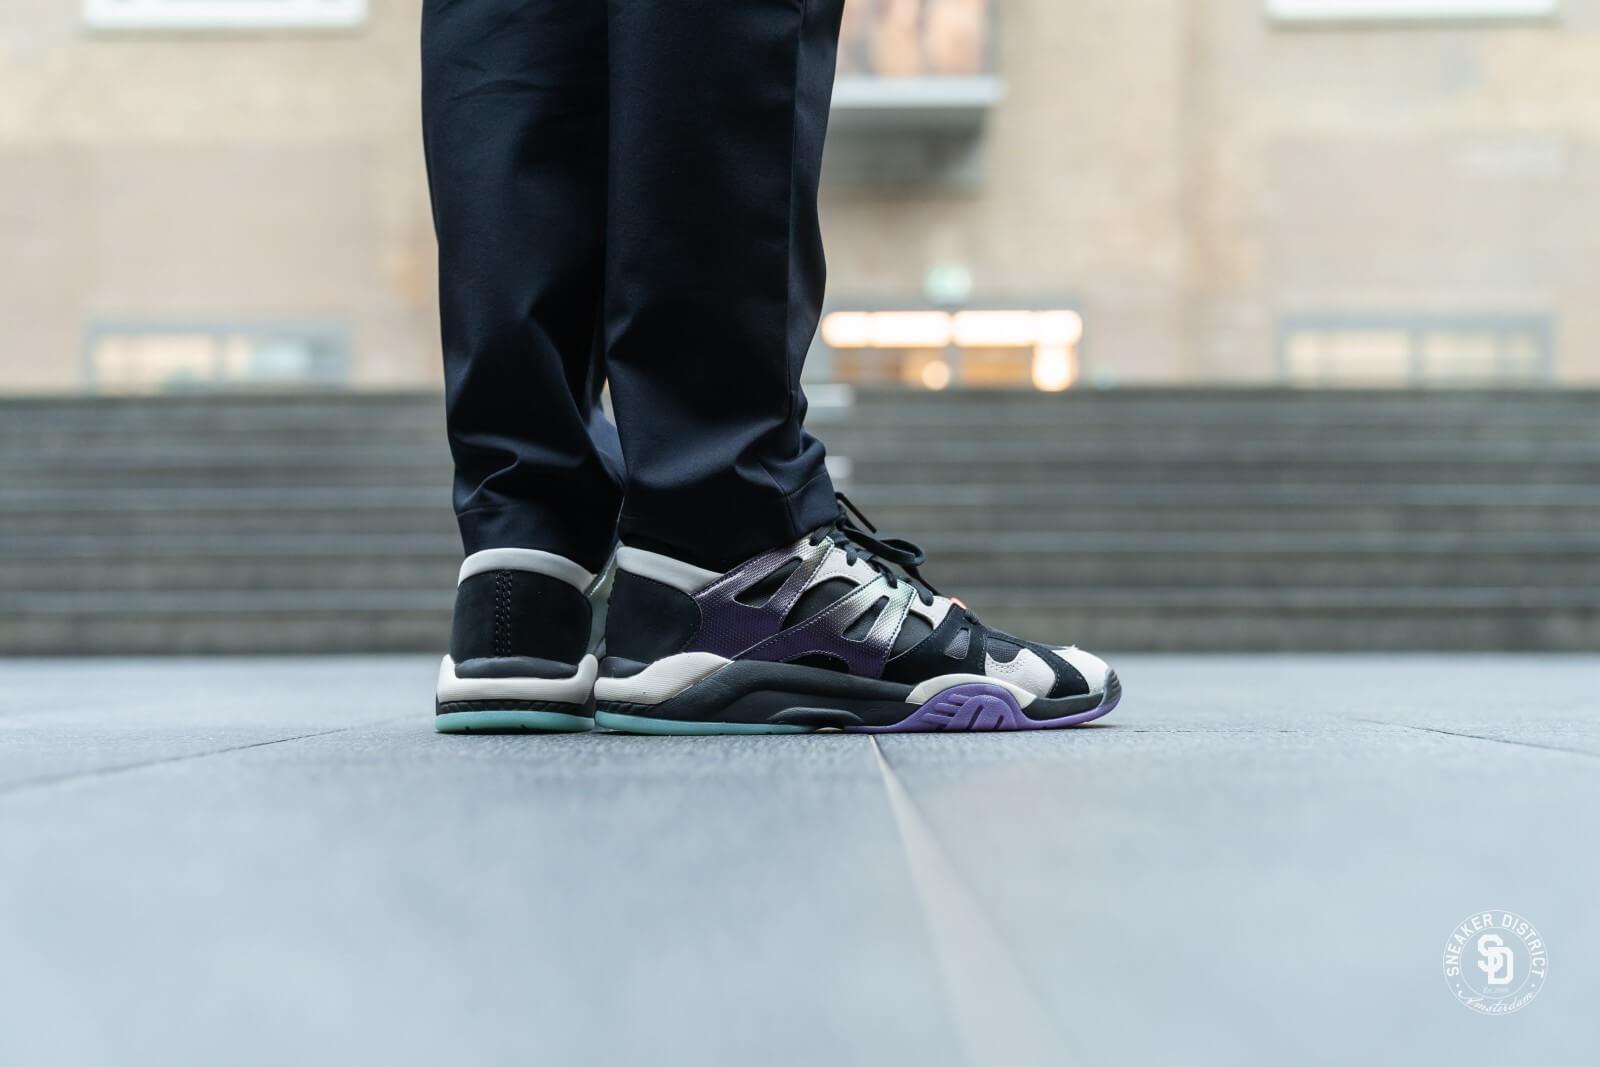 Adidas Dimension LO Black/White/Active